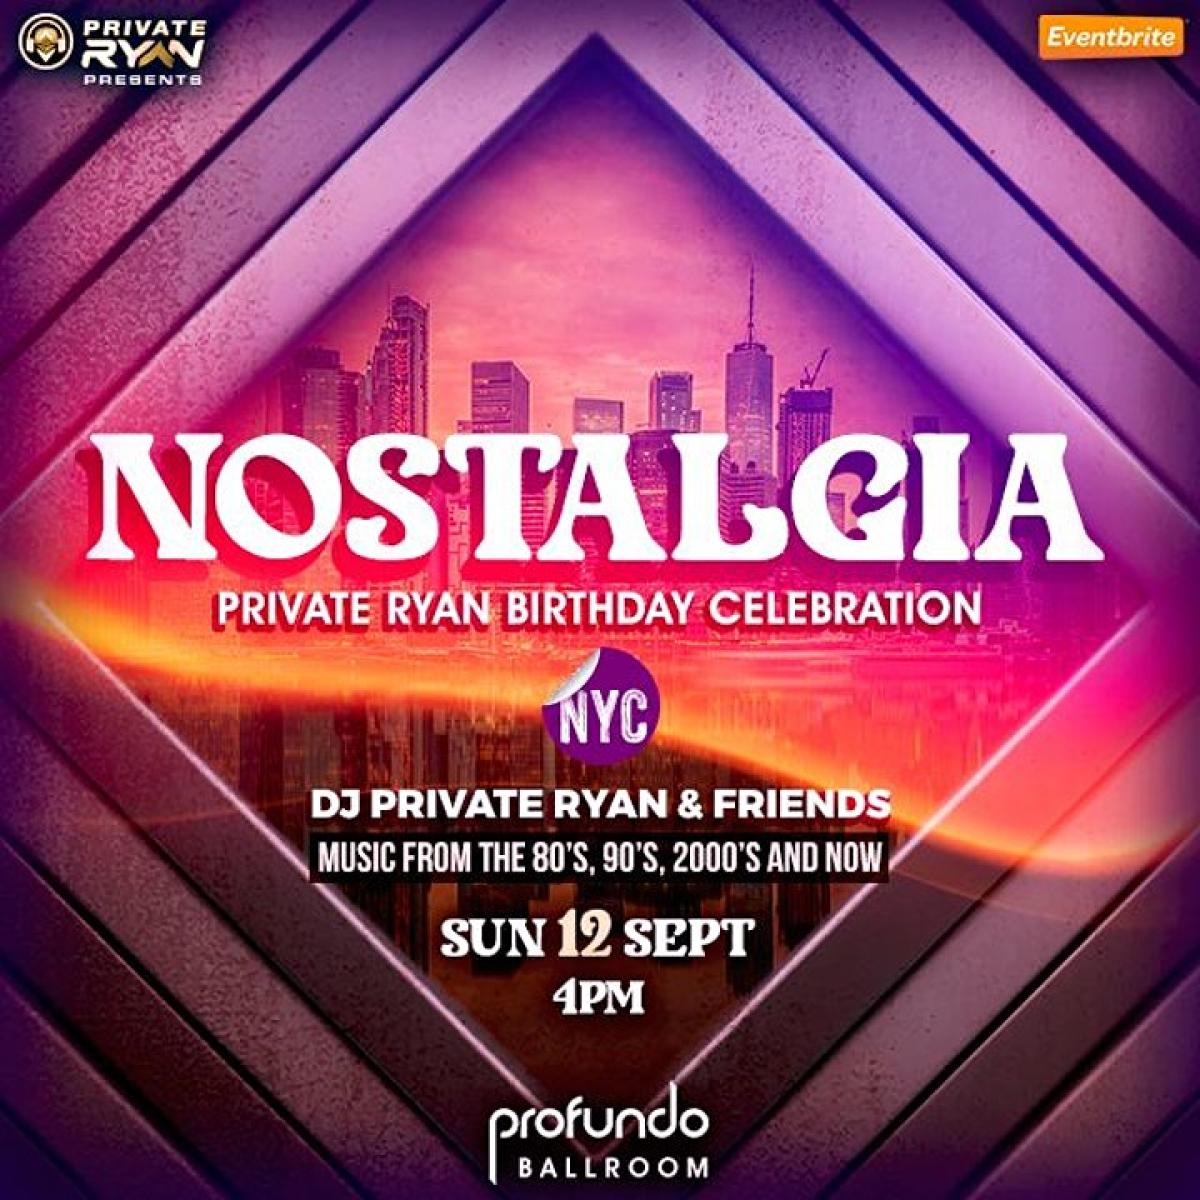 Nostalgia - Dj Private Ryan's Birthday Celebration flyer or graphic.